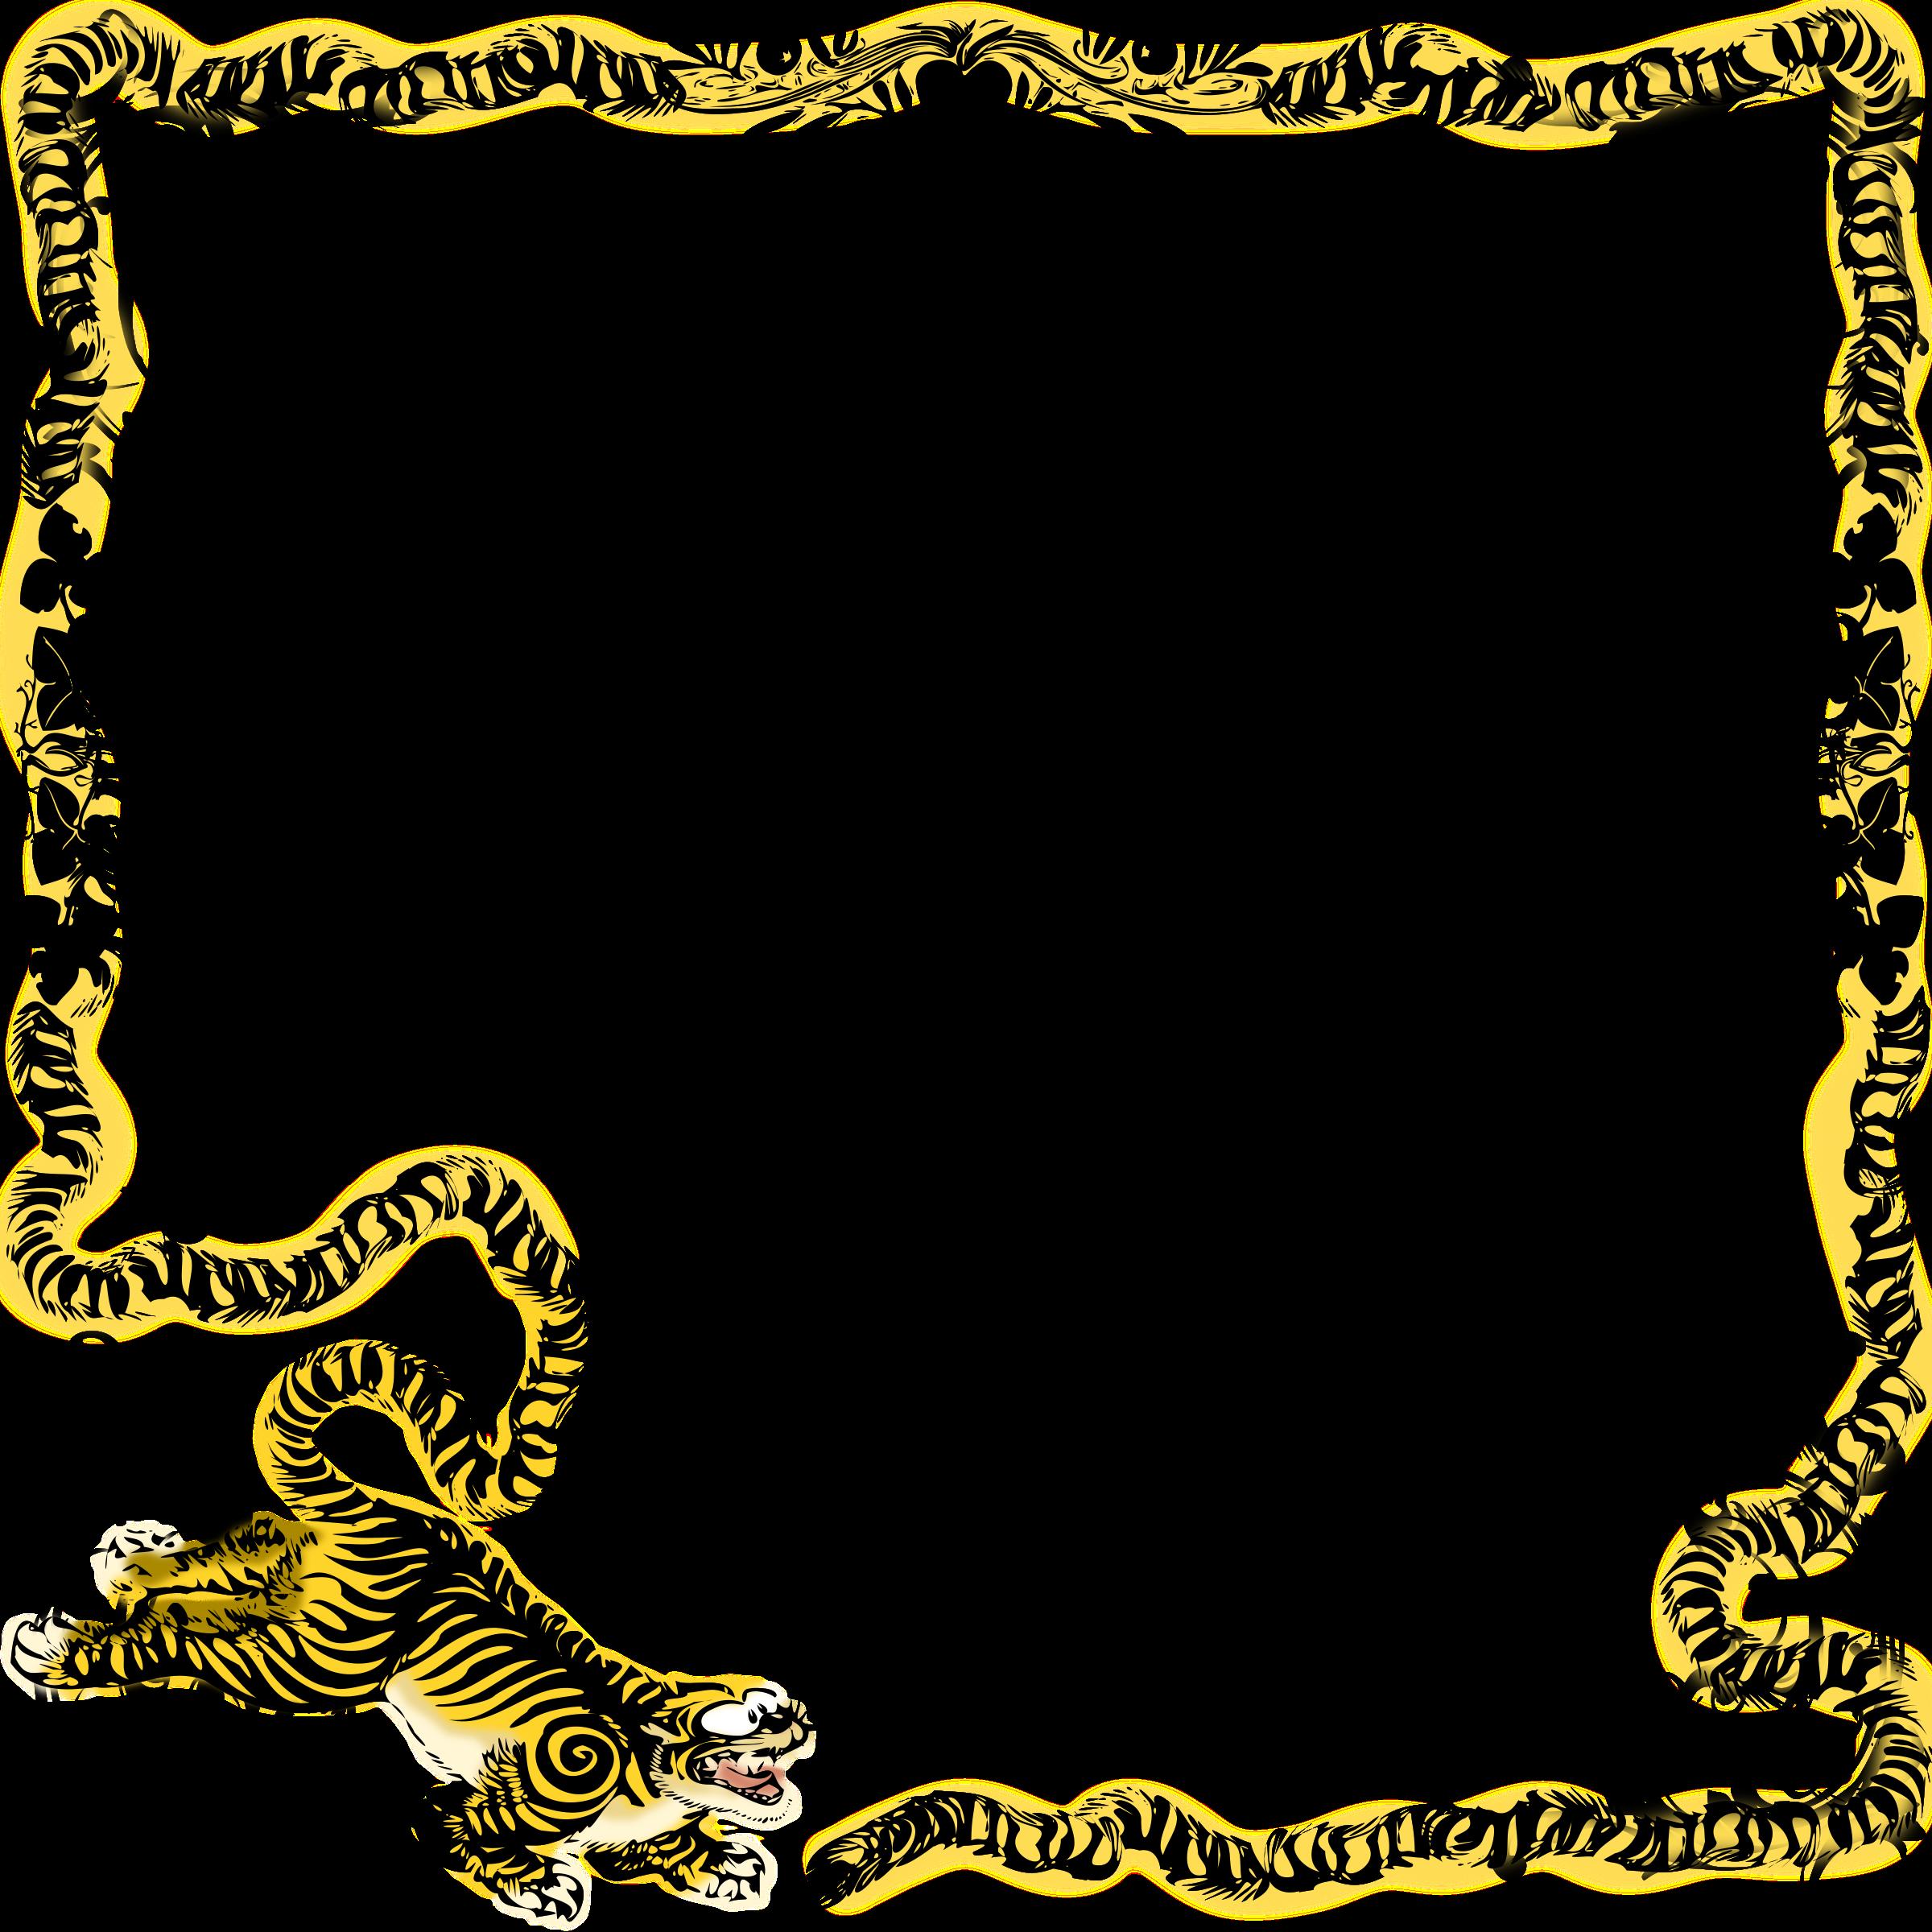 vector royalty free stock Tiger frame mono big. Animal border clipart